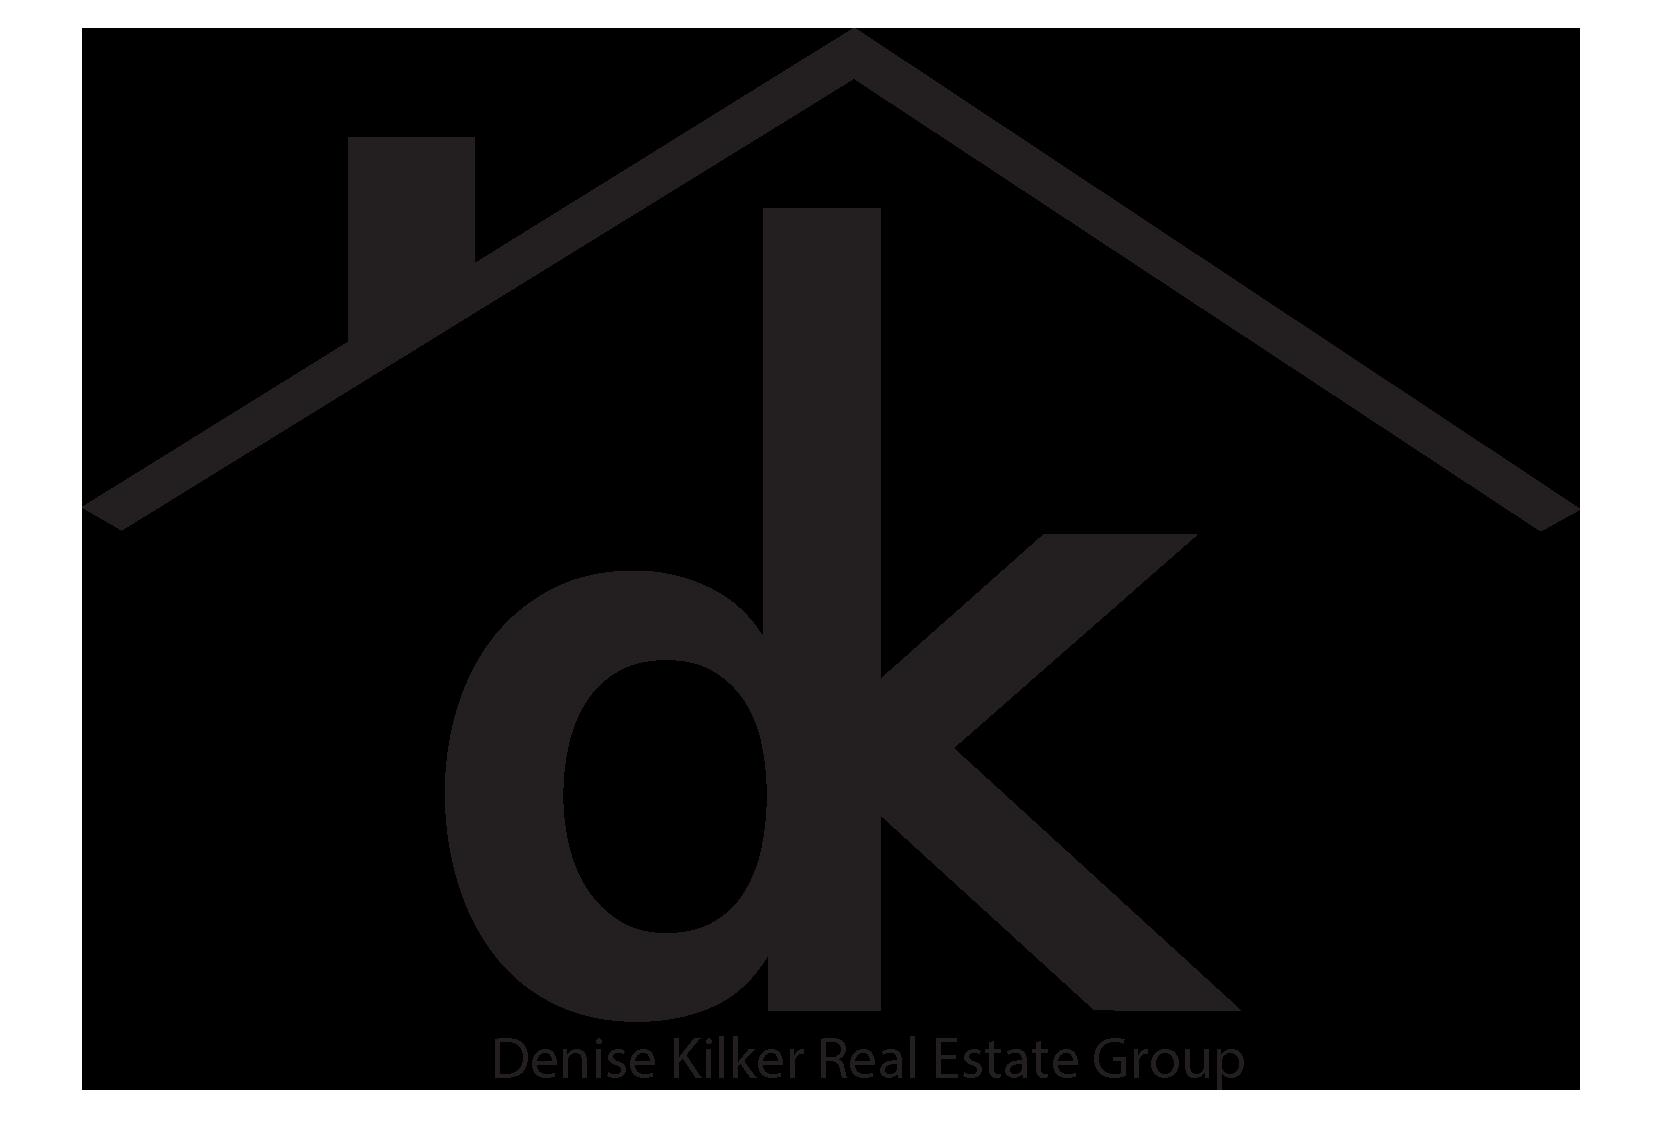 Denise-Kilker-LOGO-Large-BLK